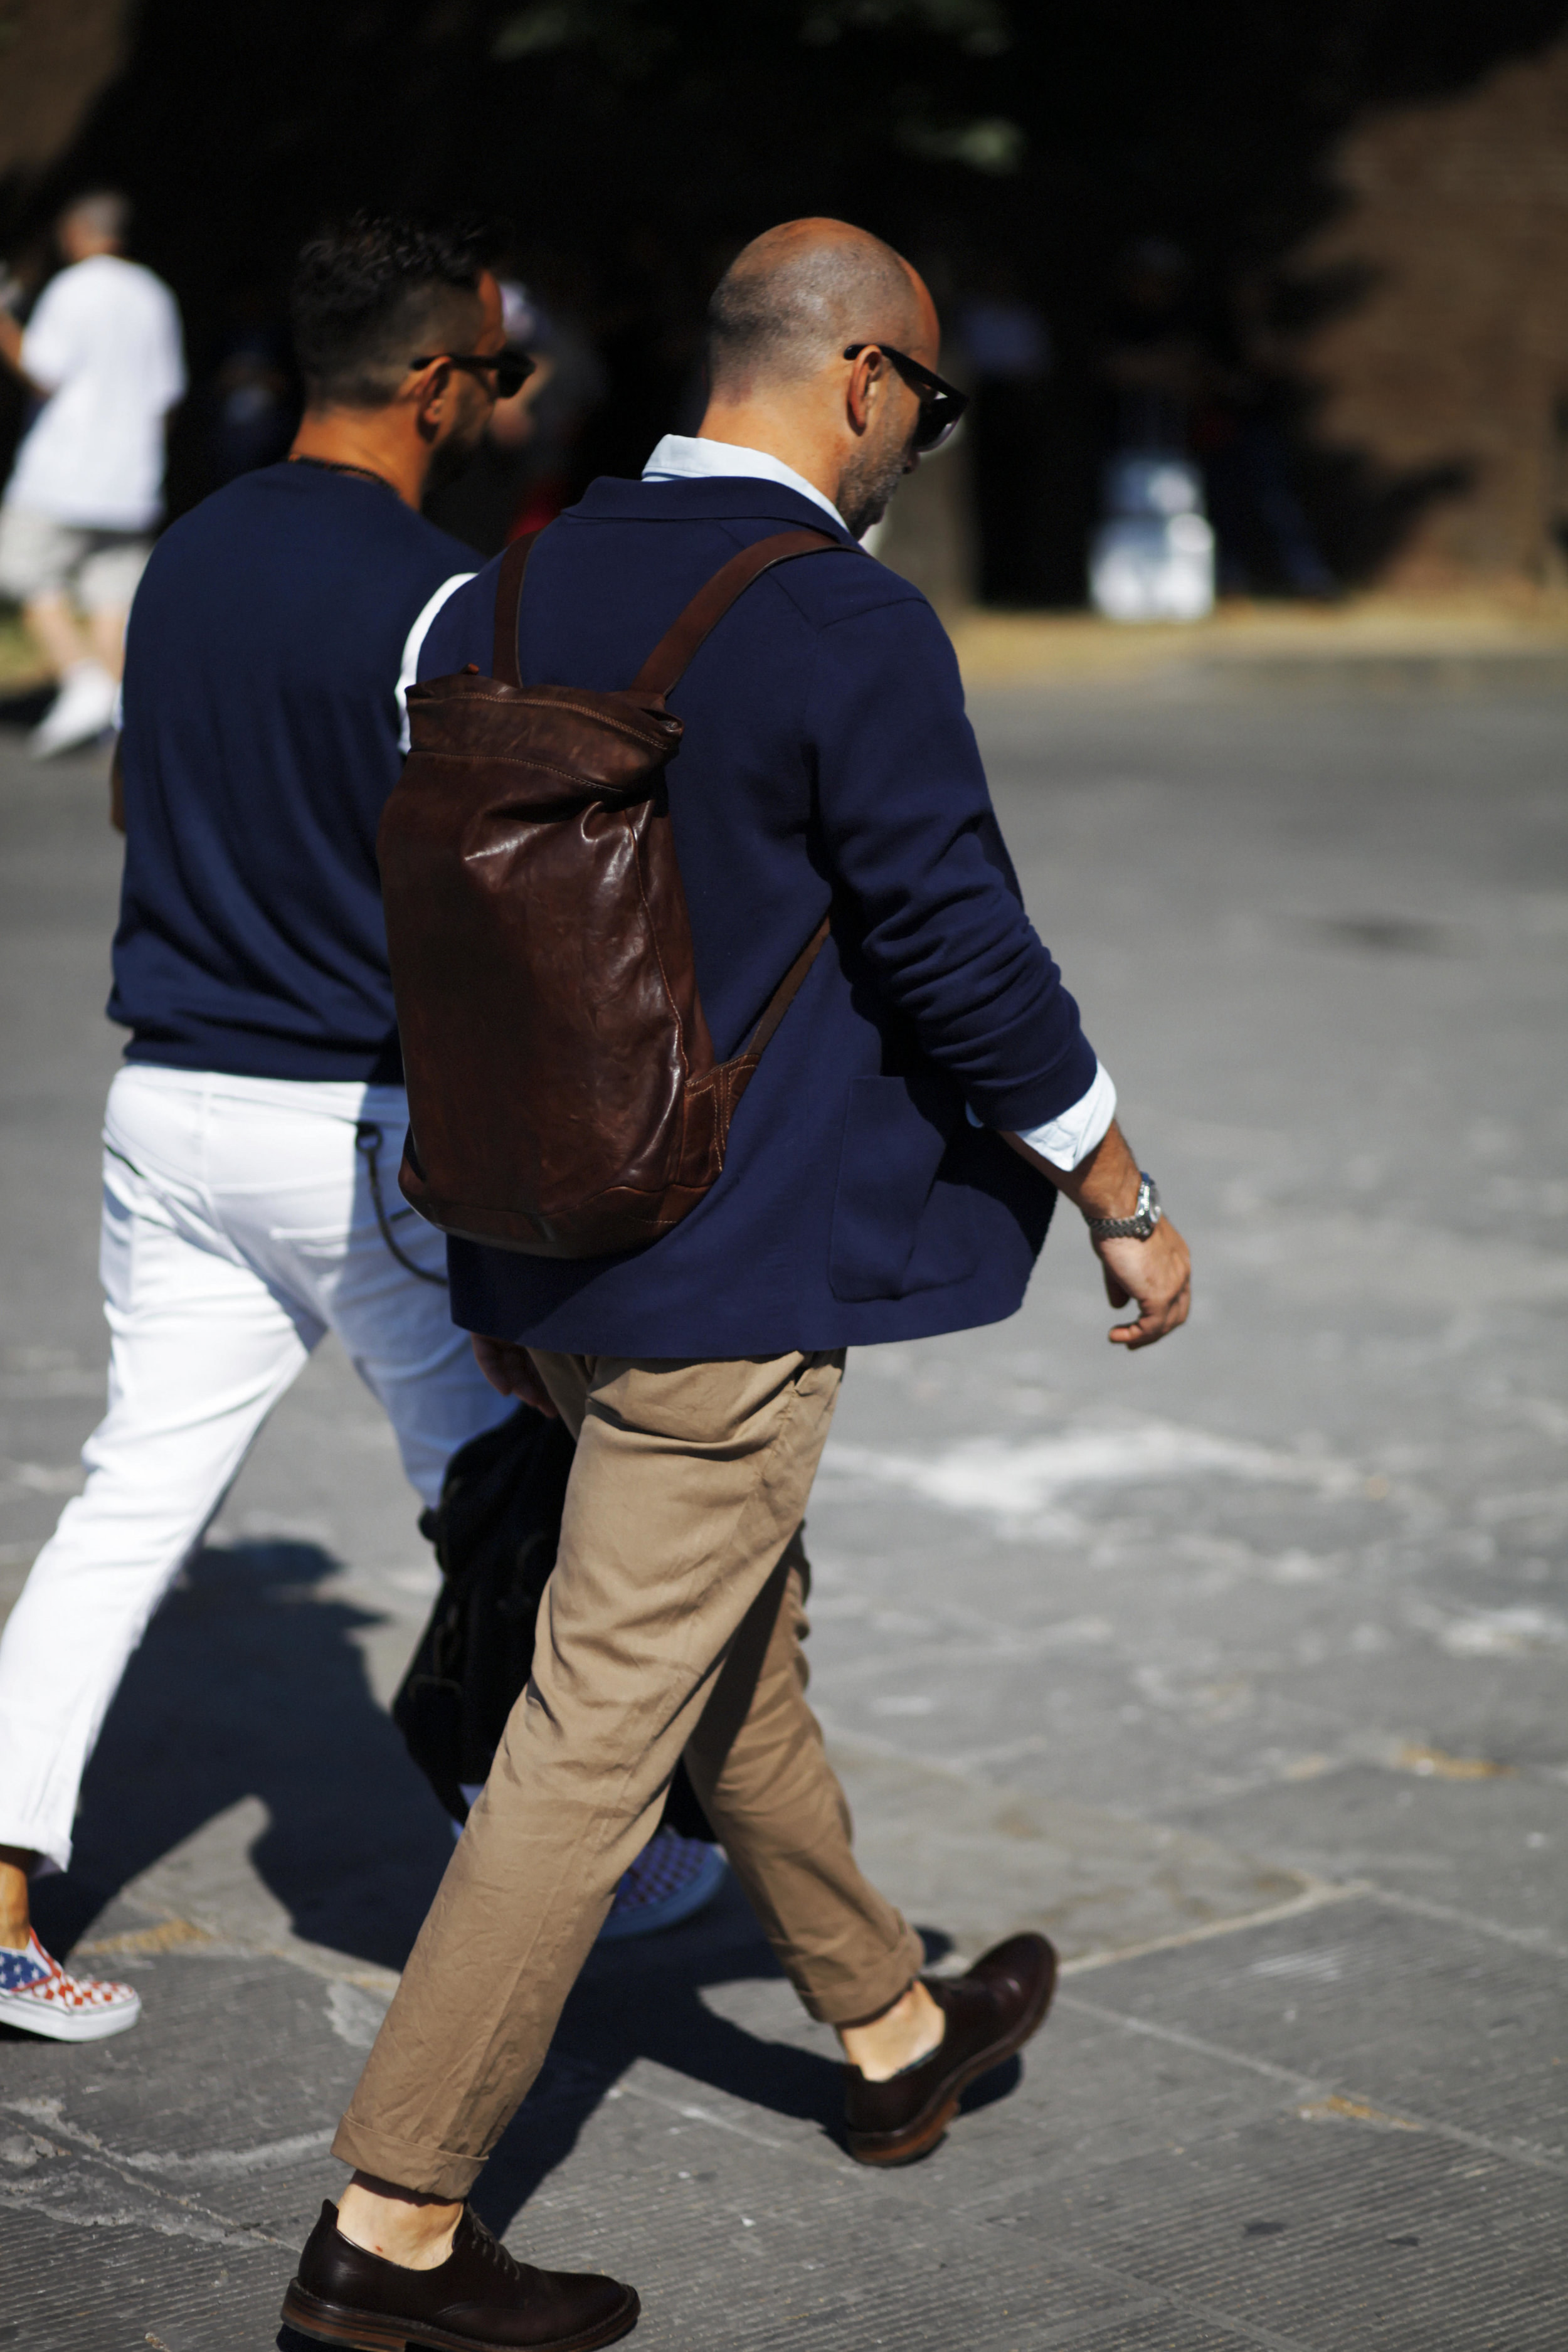 Pitti Uomo les indispensables paris 92 Florence sac bag